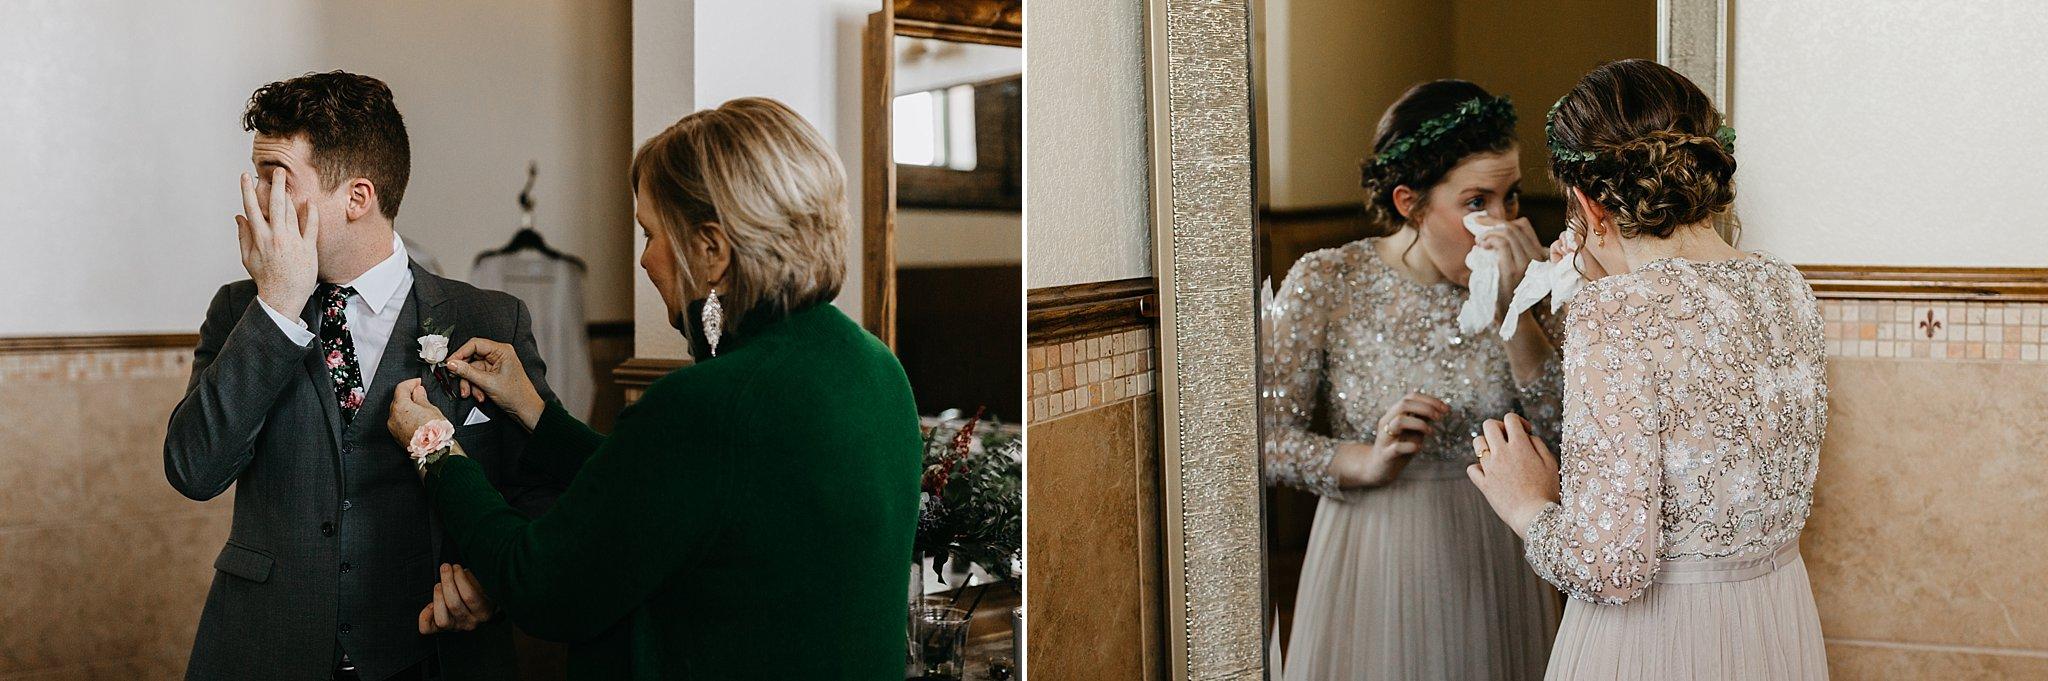 Wilderlove Co_Waco Texas_The Phoenix_Romantic Wedding Photography_0019.jpg